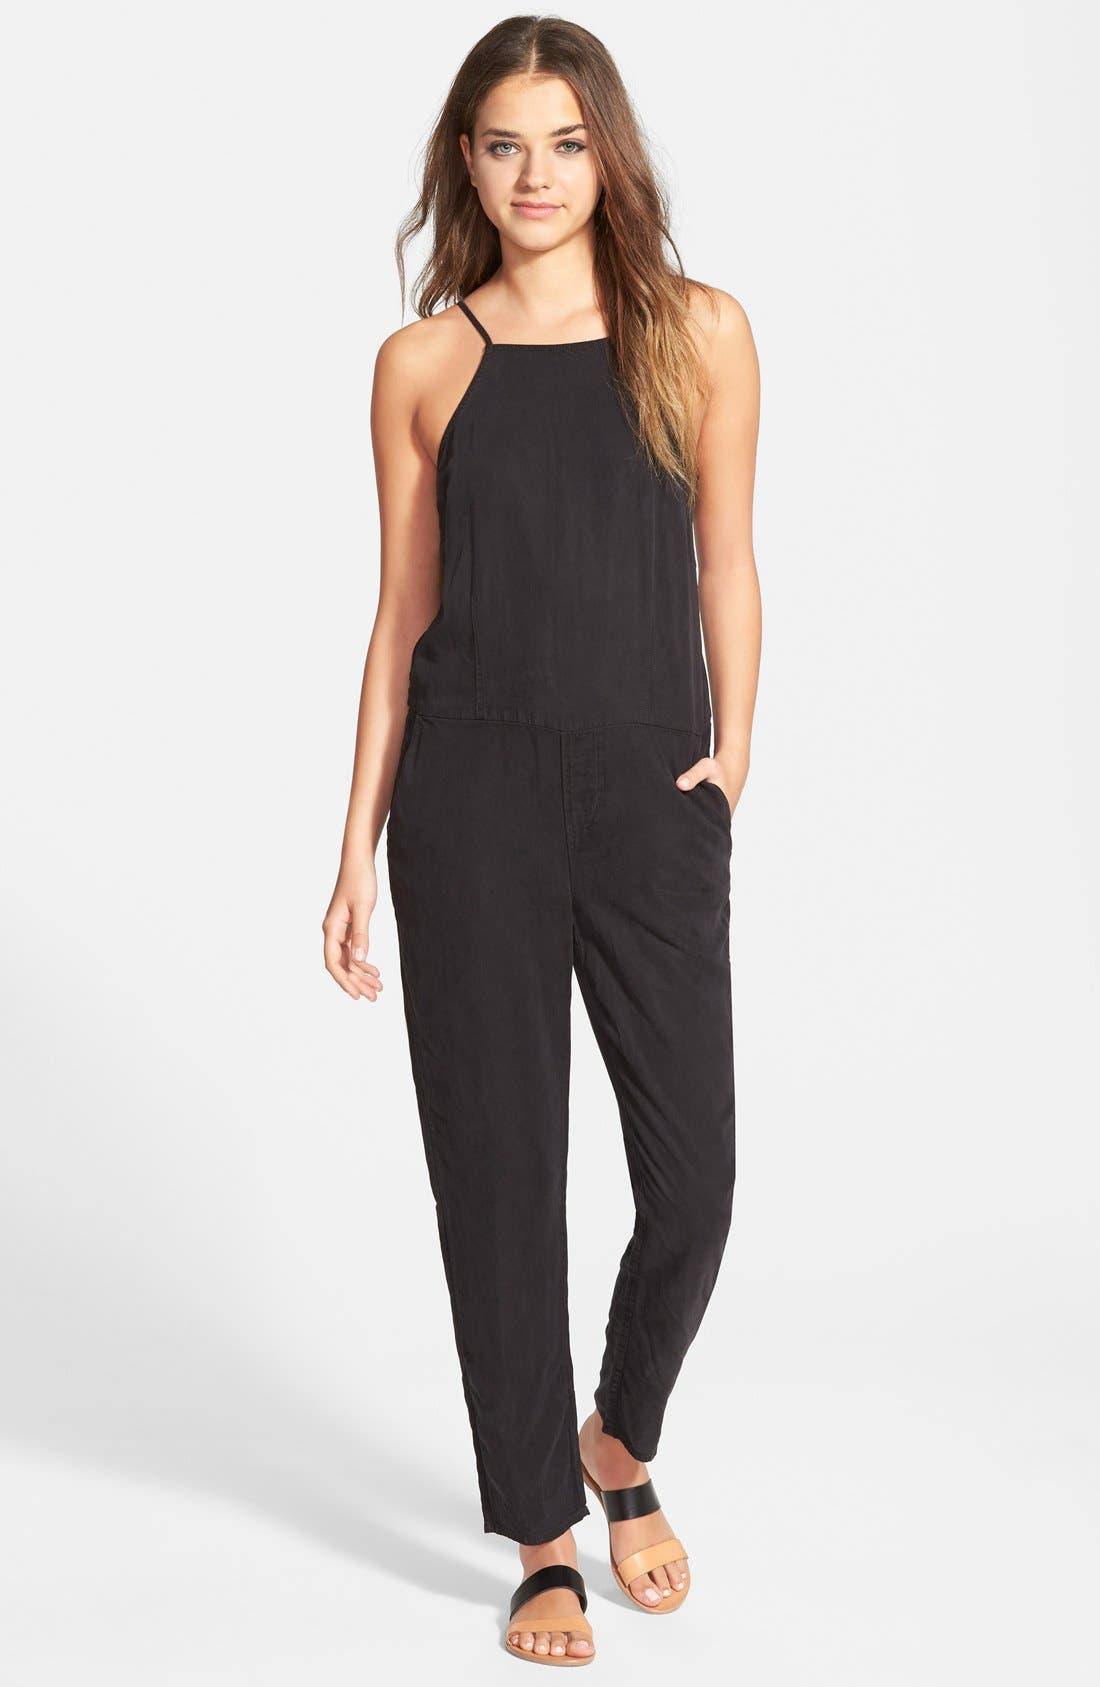 Alternate Image 1 Selected - Paige Denim 'Anjelica' Sleeveless Jumpsuit (Black Overdye)